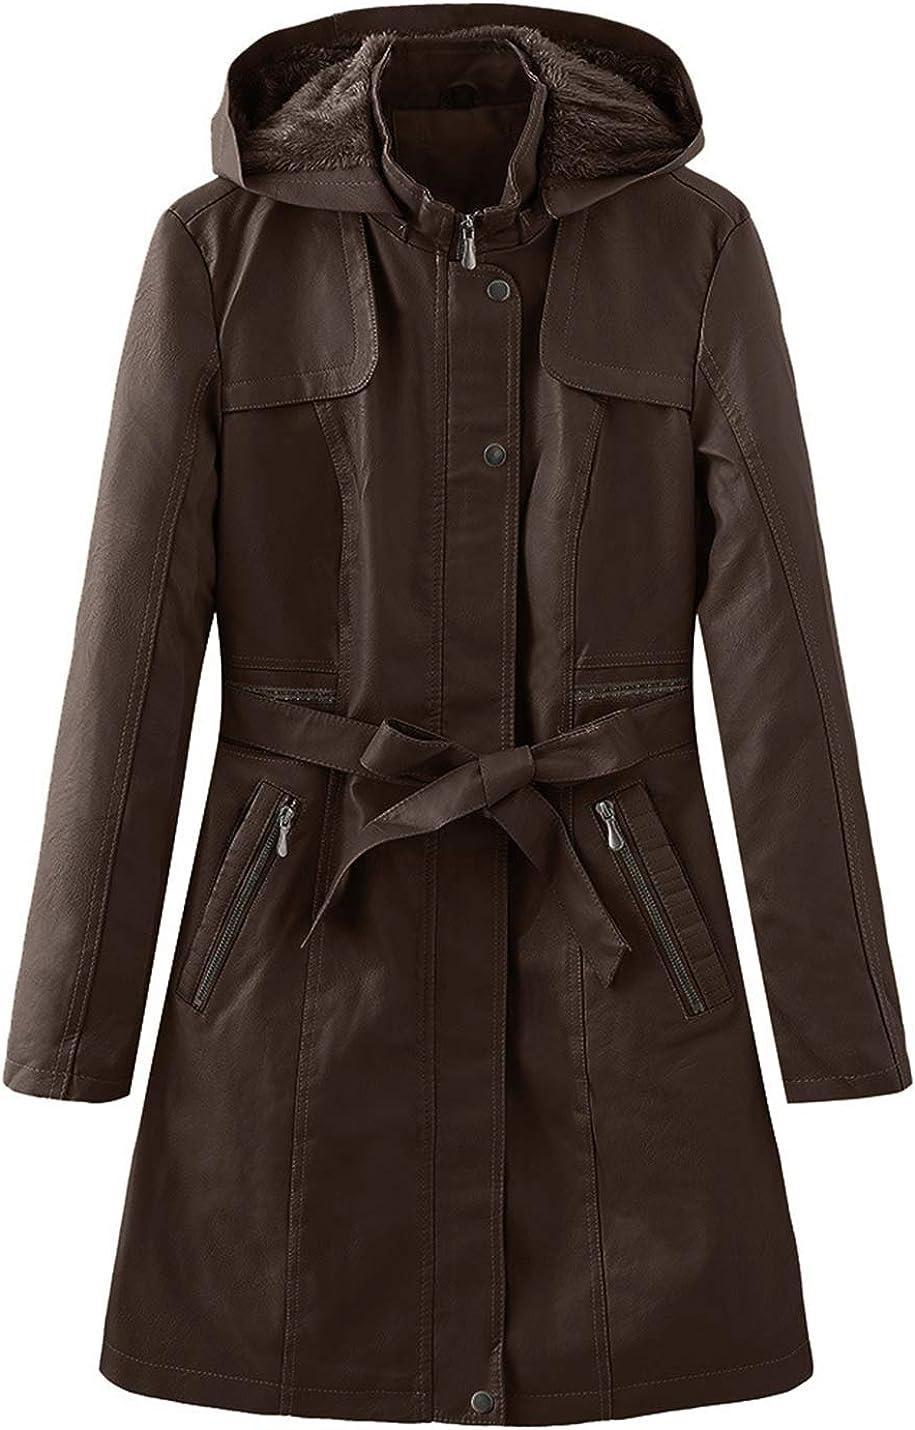 Gihuo Women's Faux Fur Removable Hood Fleece Lined Jacket Trench Coat